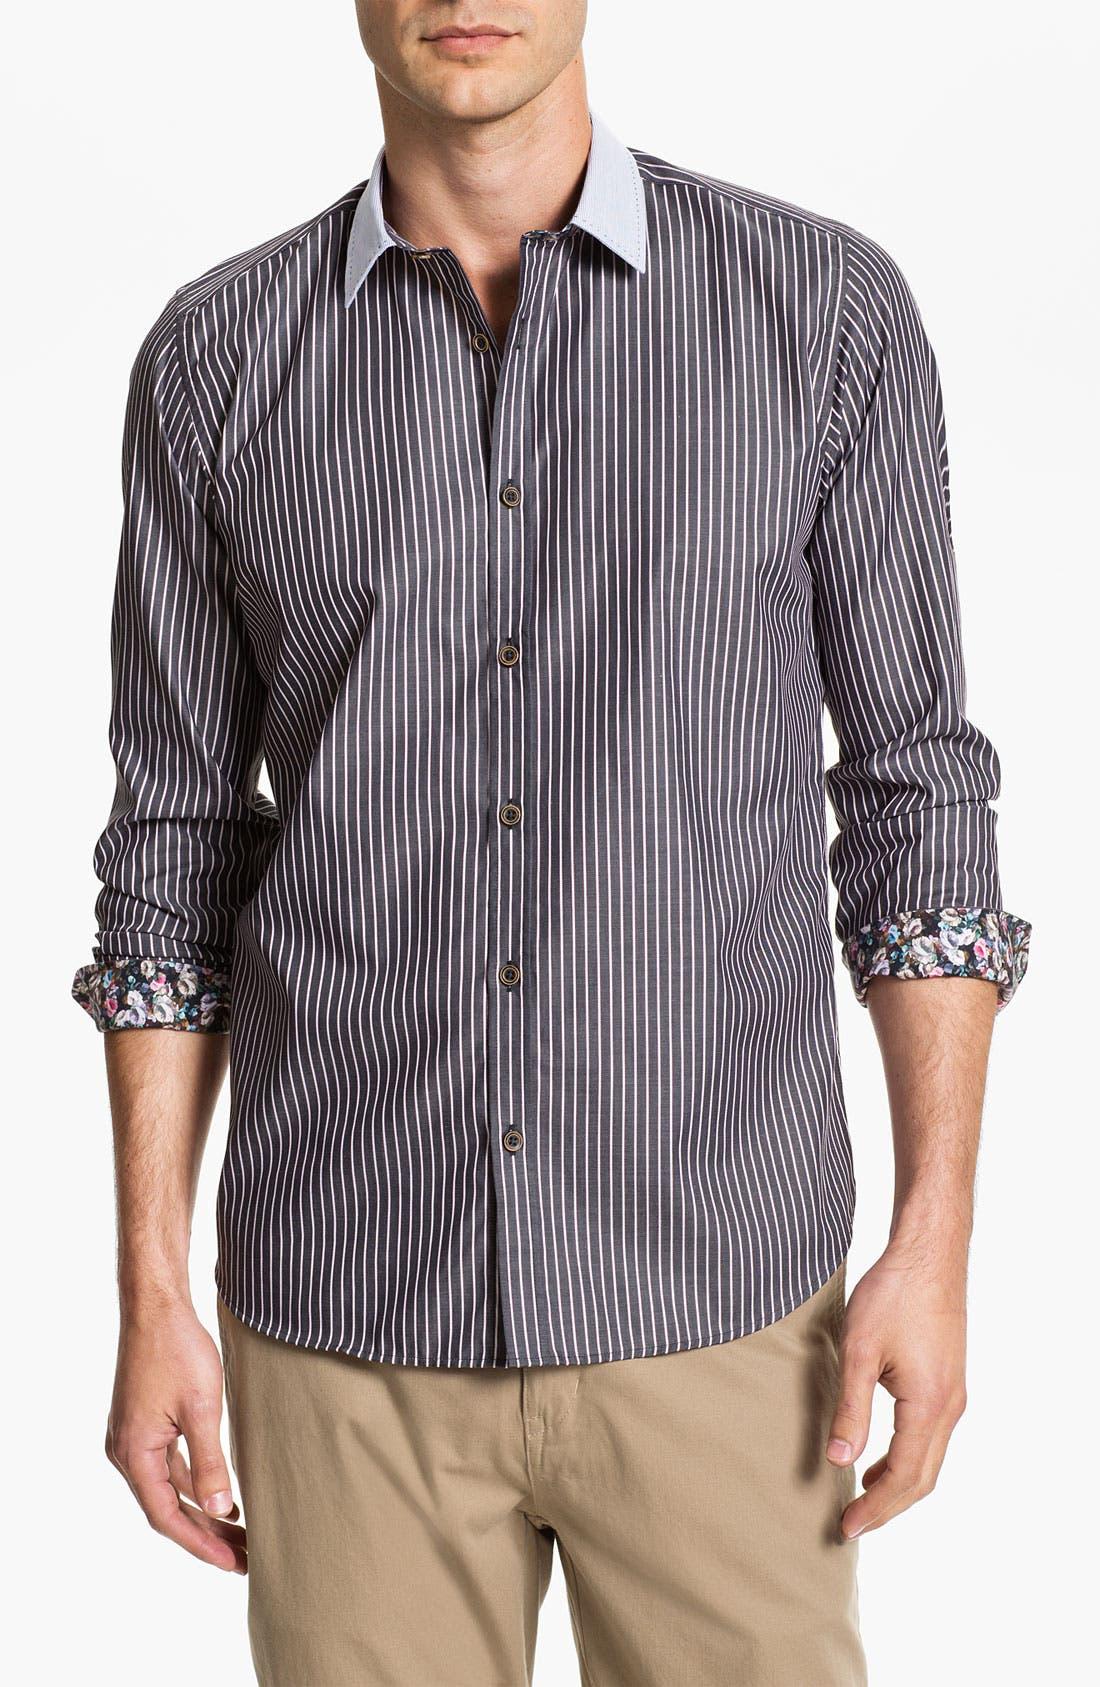 Alternate Image 1 Selected - Ted Baker London 'Asaigo' Sport Shirt